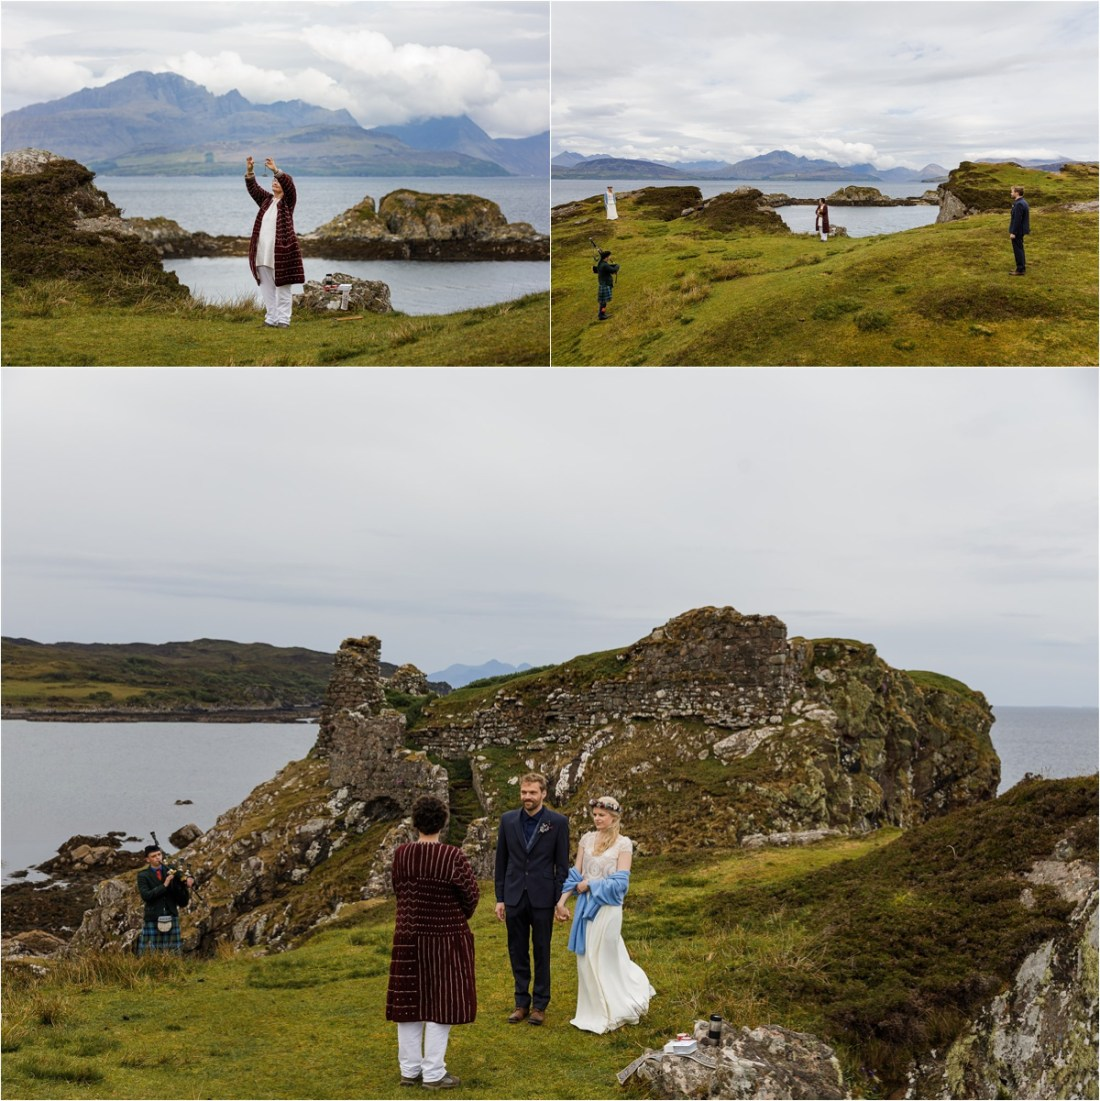 Isle of Skye elopement wedding in Scotland by Lynne Kennedy Photography